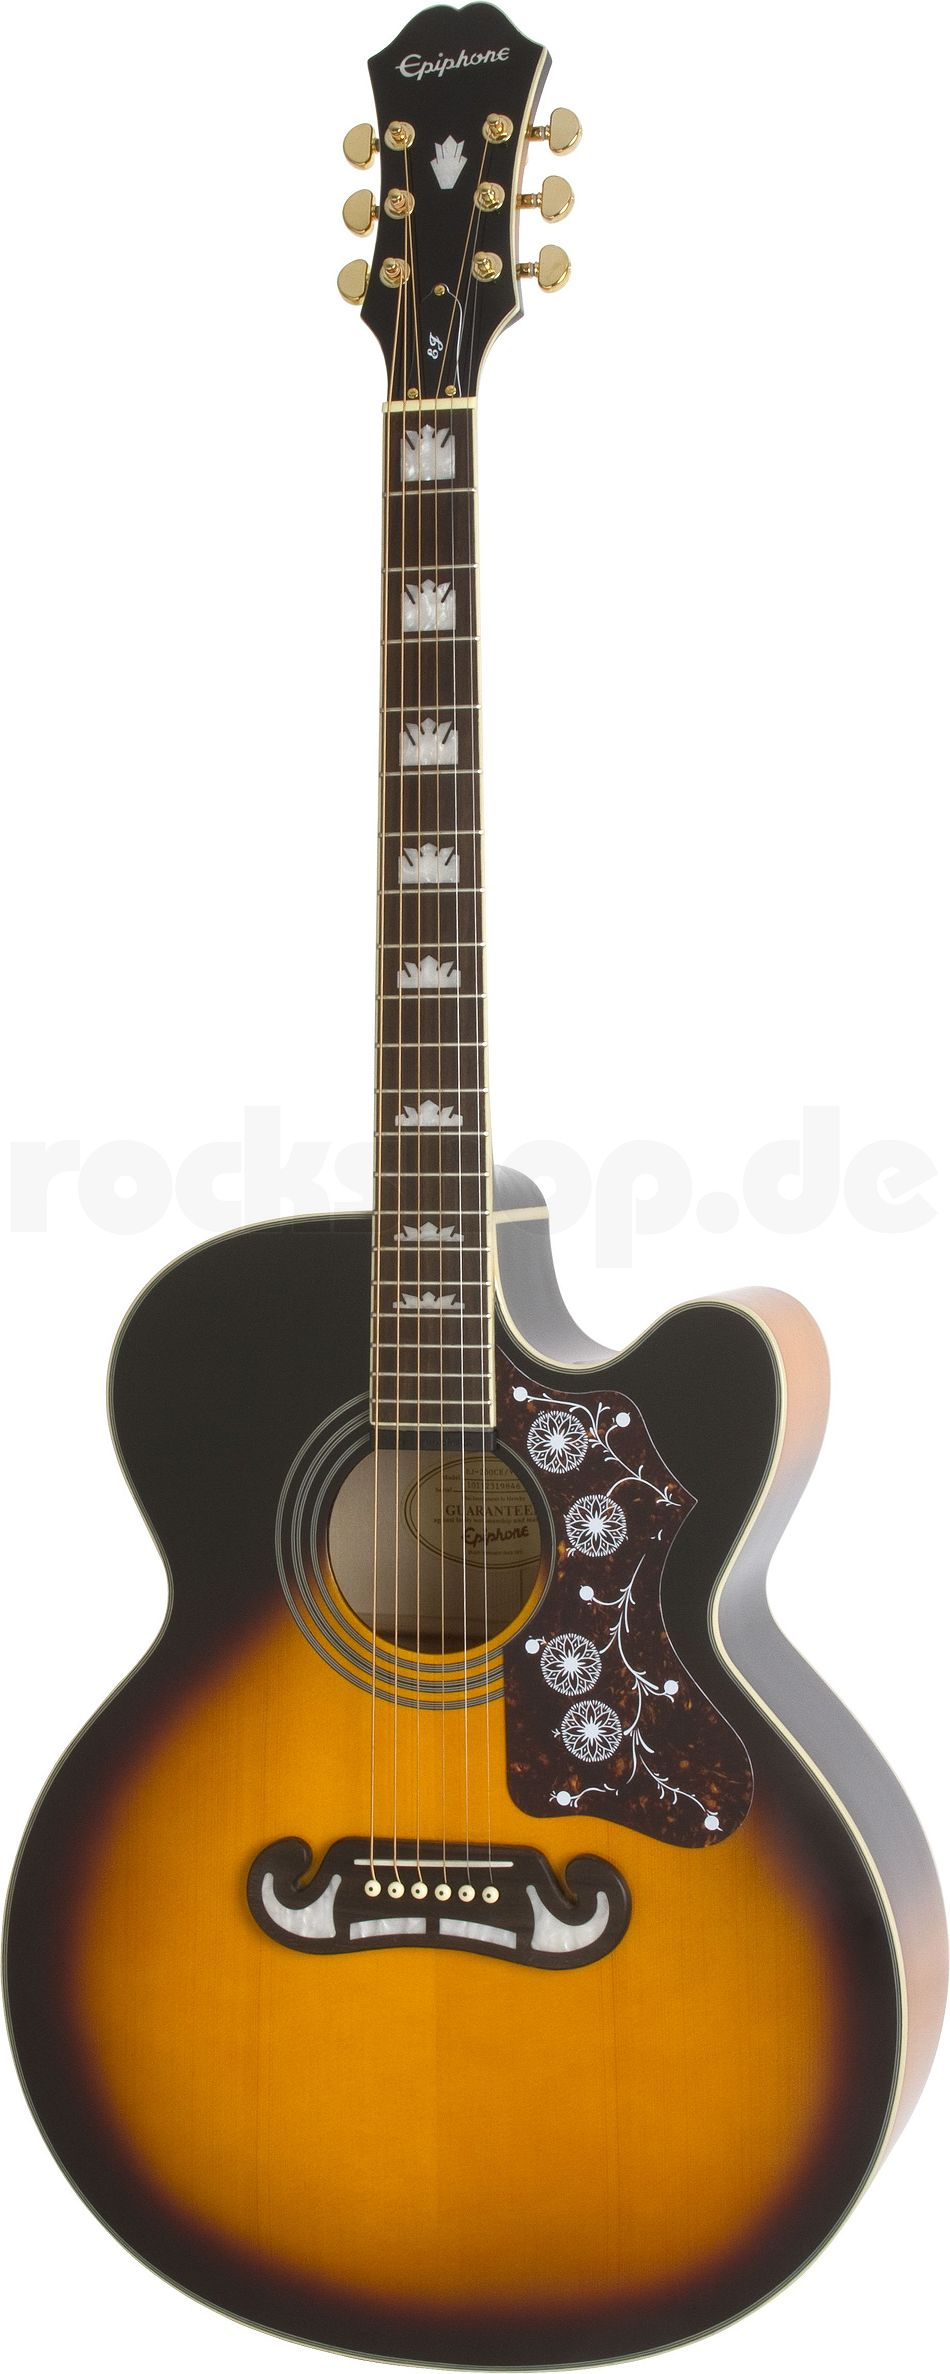 Gibson j200 Akustikgitarre Vintage Sunburst